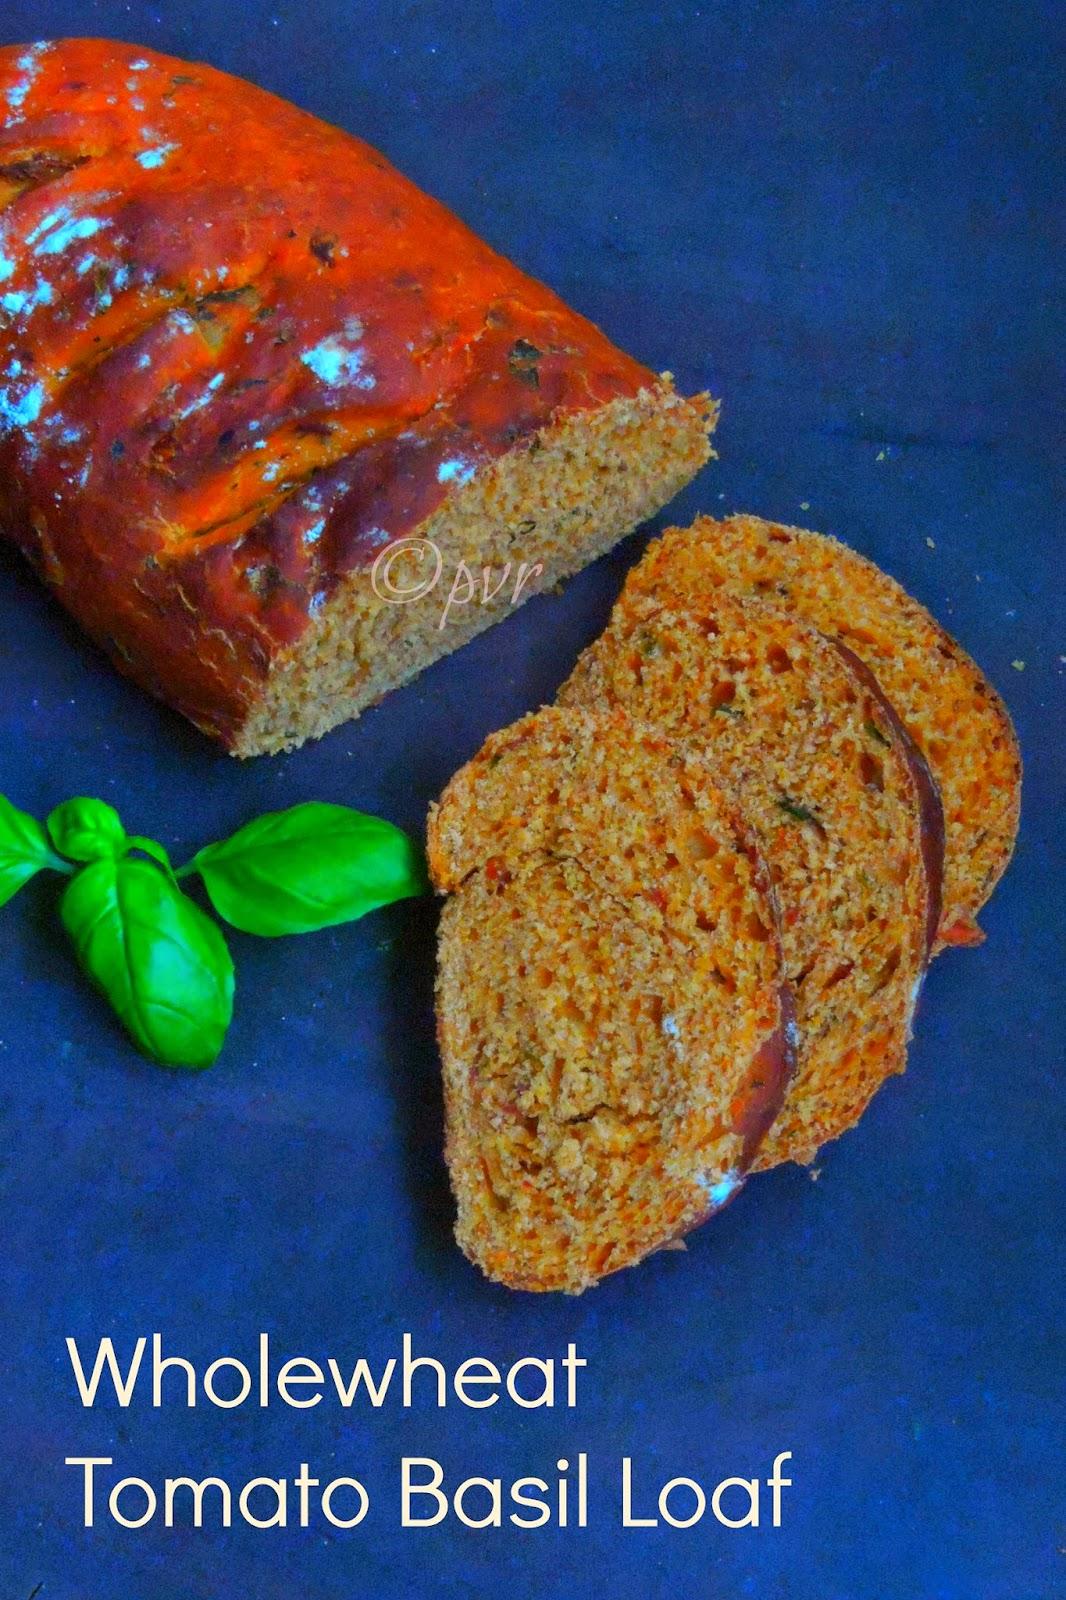 Vegan Wholewheat Tomato Basil Loaf